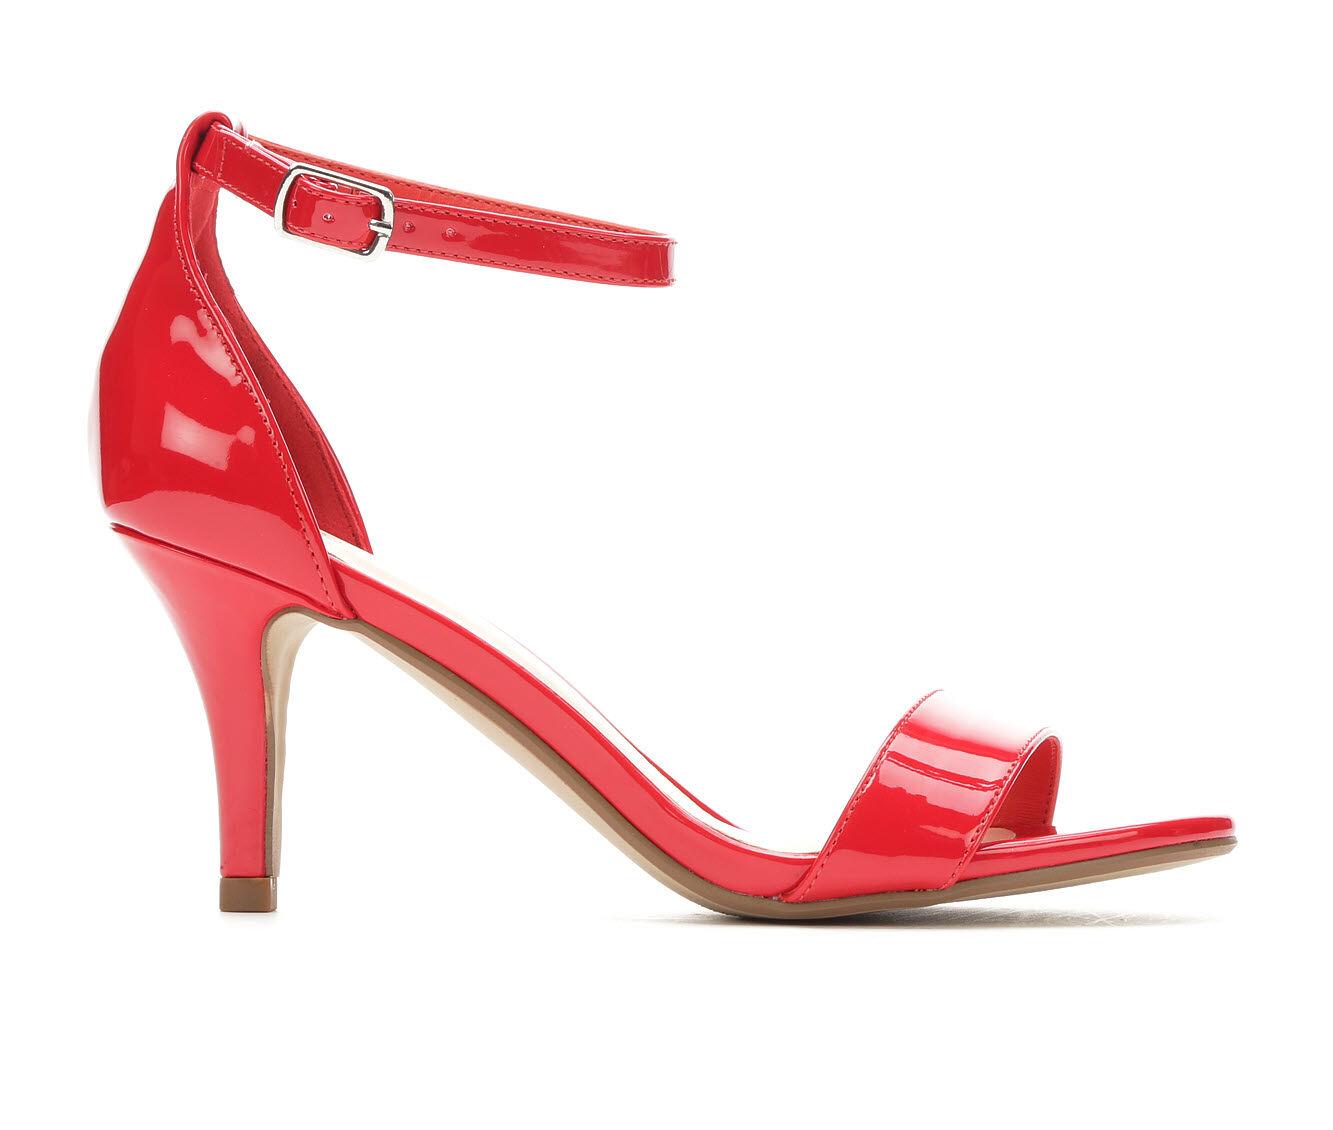 uk shoes_kd6172